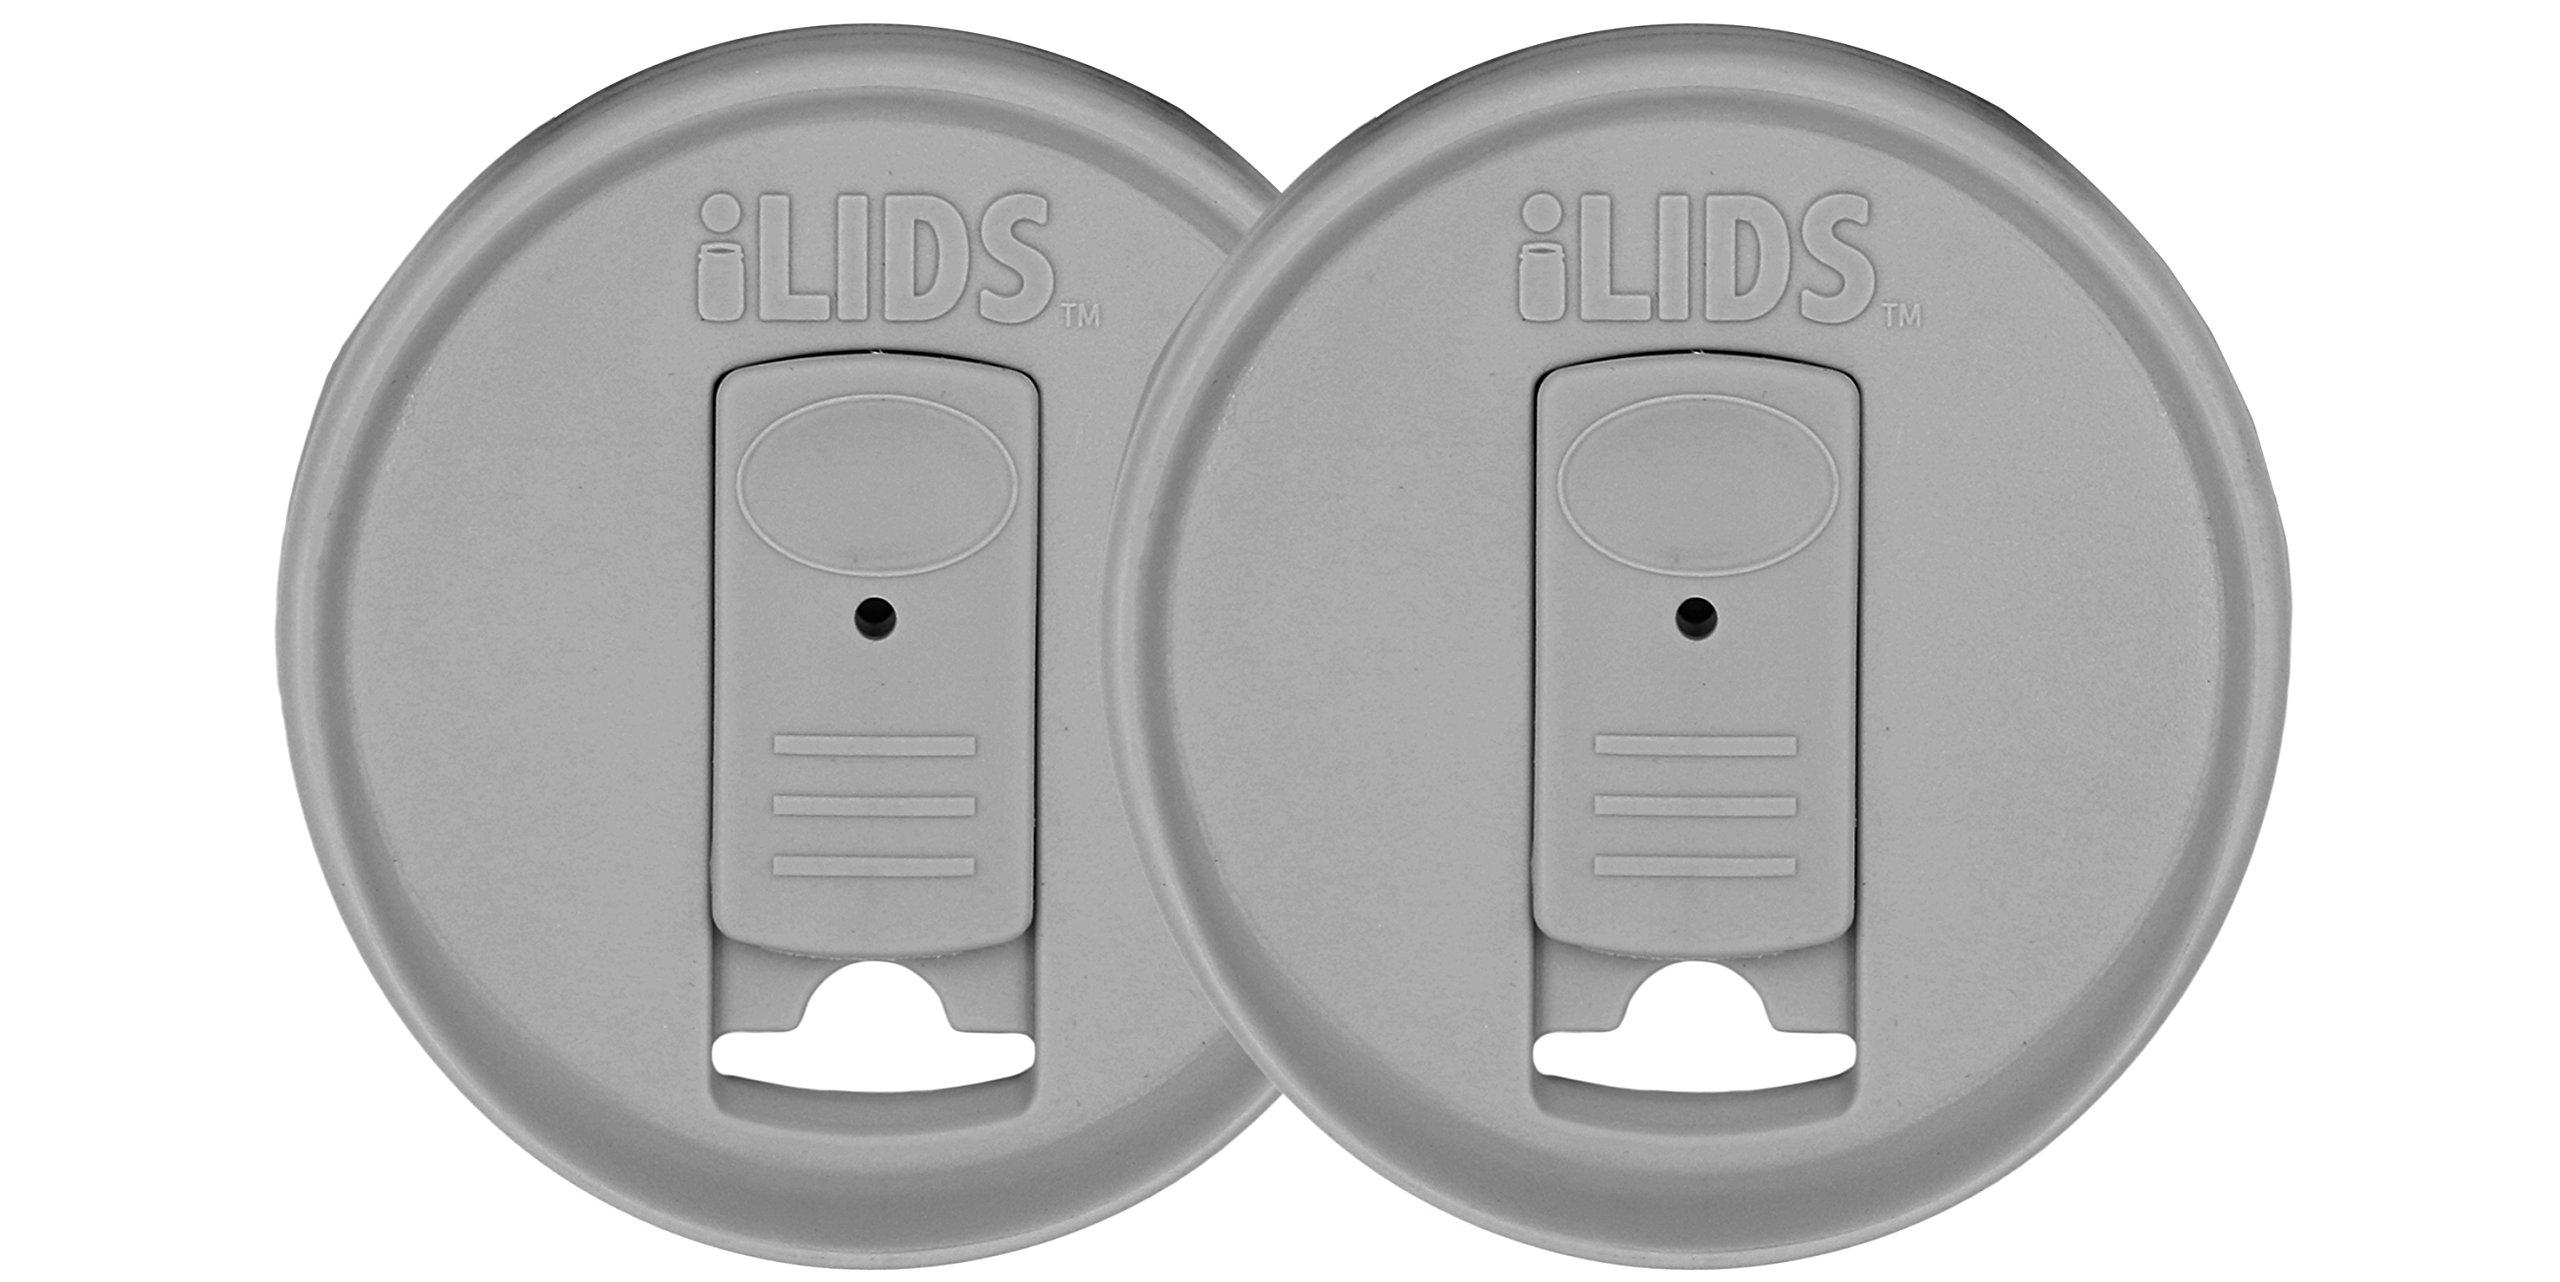 iLids Mason Jar Drink Lid, Regular Mouth, Gray, 2-Pack